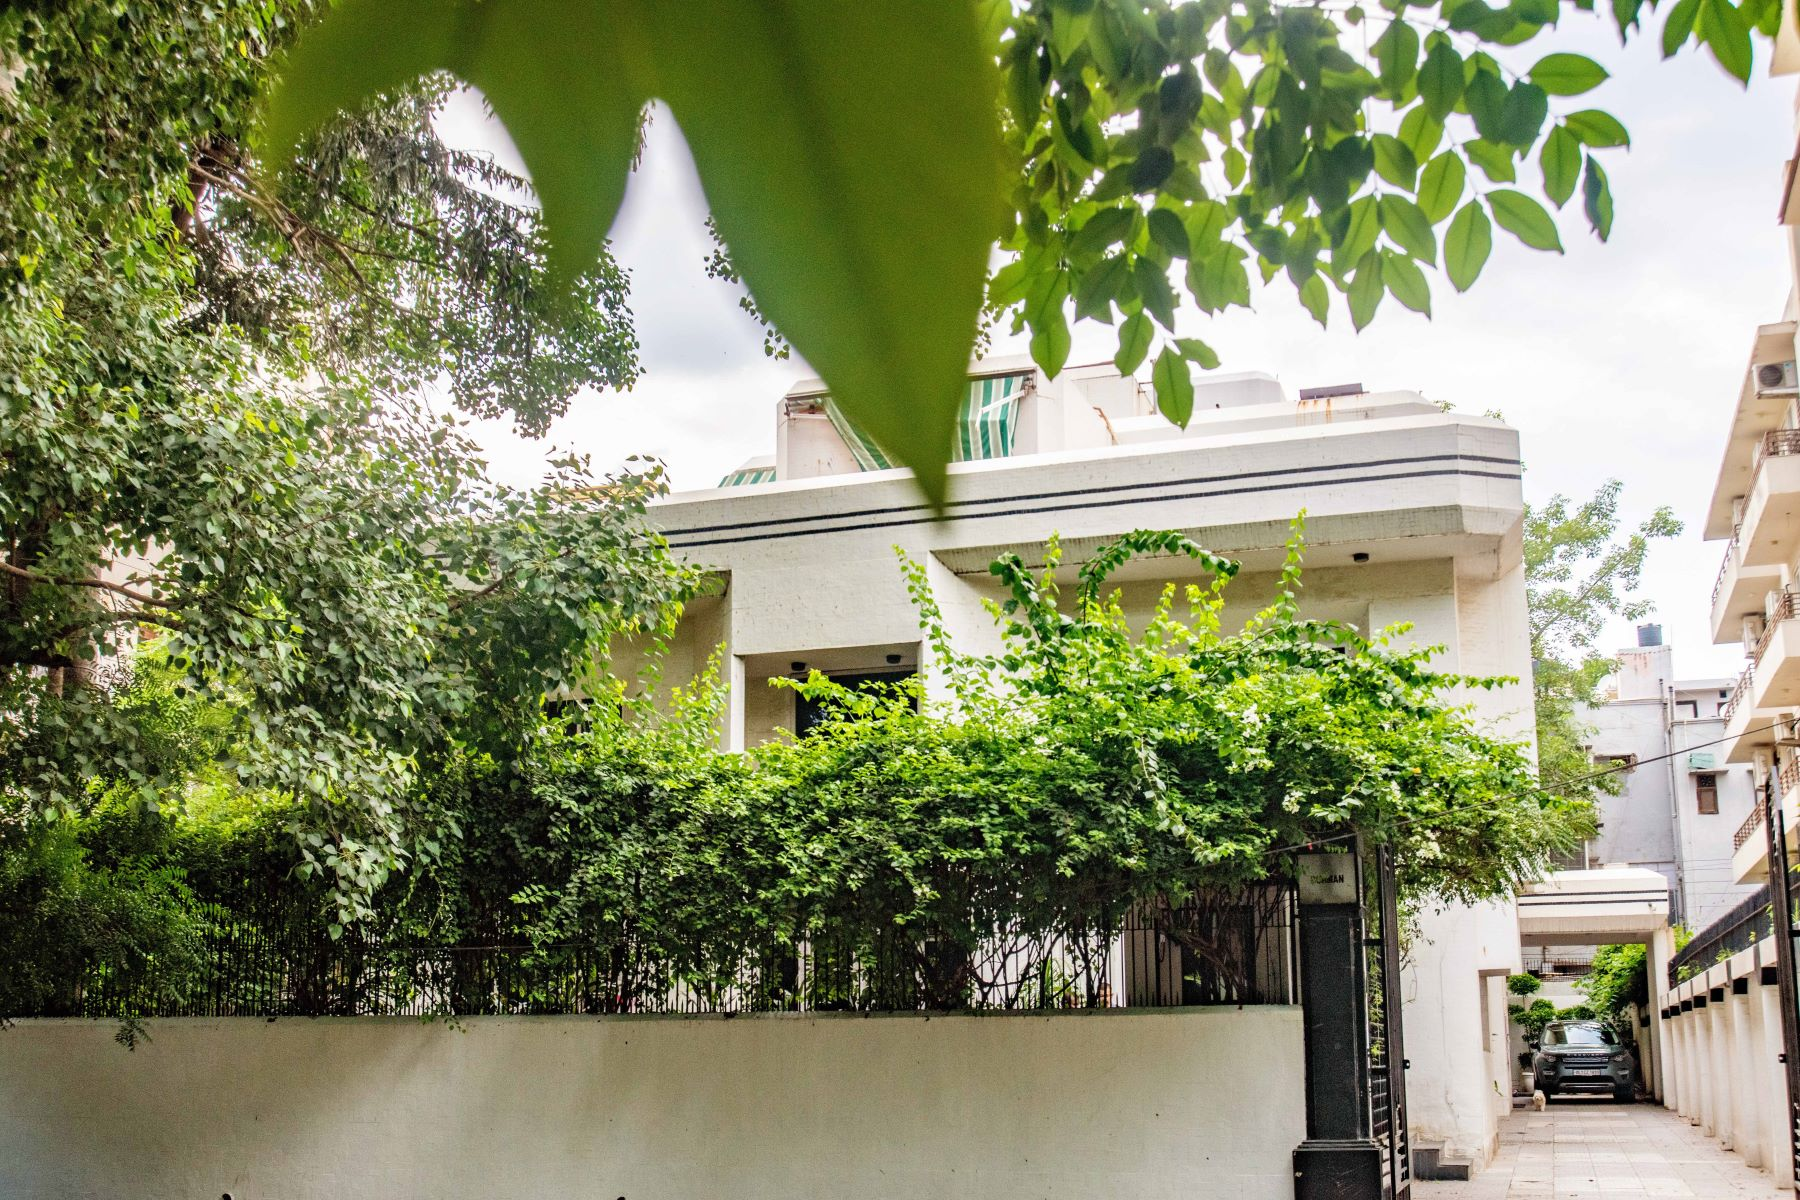 Additional photo for property listing at Bungalow in Shanti Niketan Shanti Niketan New Delhi, Delhi 110021 India